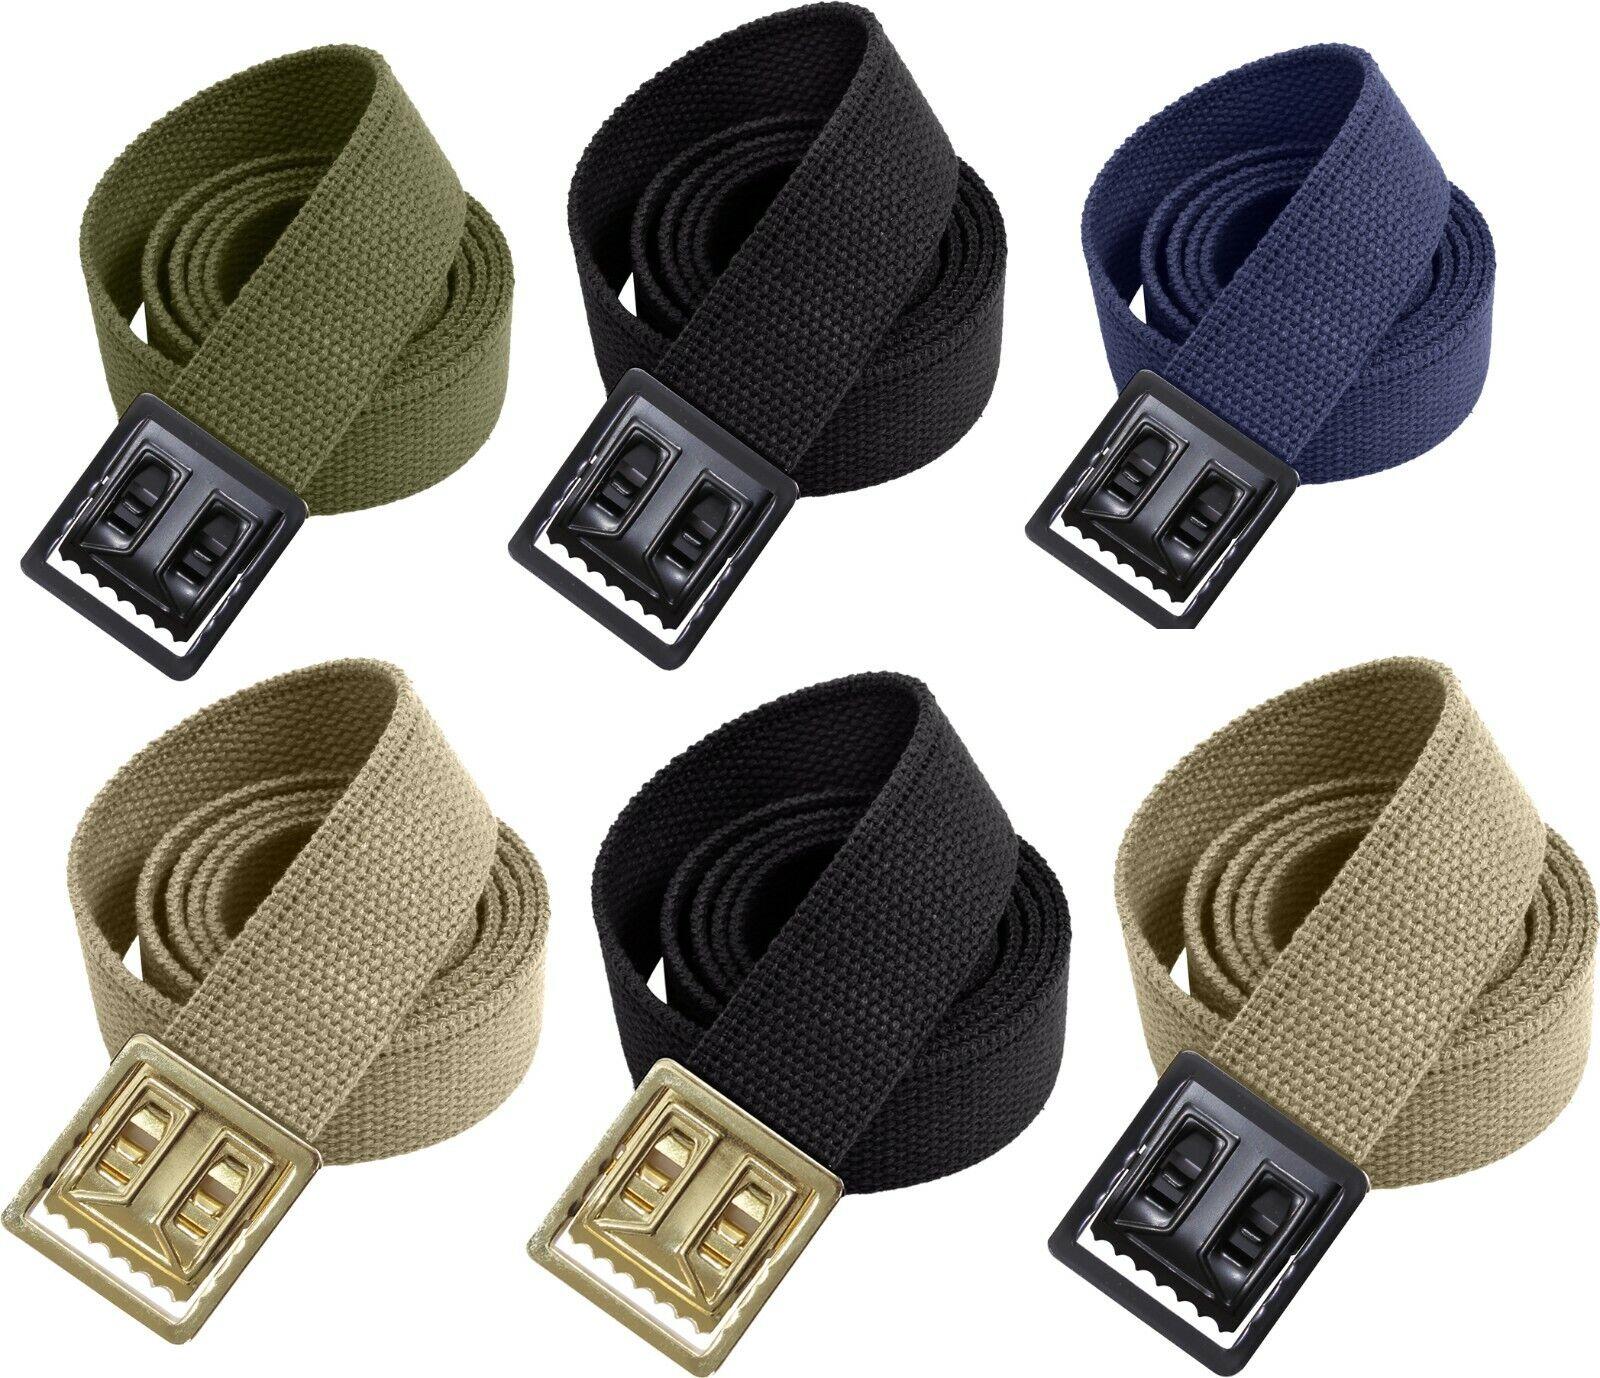 Military Heavy Duty 100% Cotton Web Belt with Open Face Buckle Belts